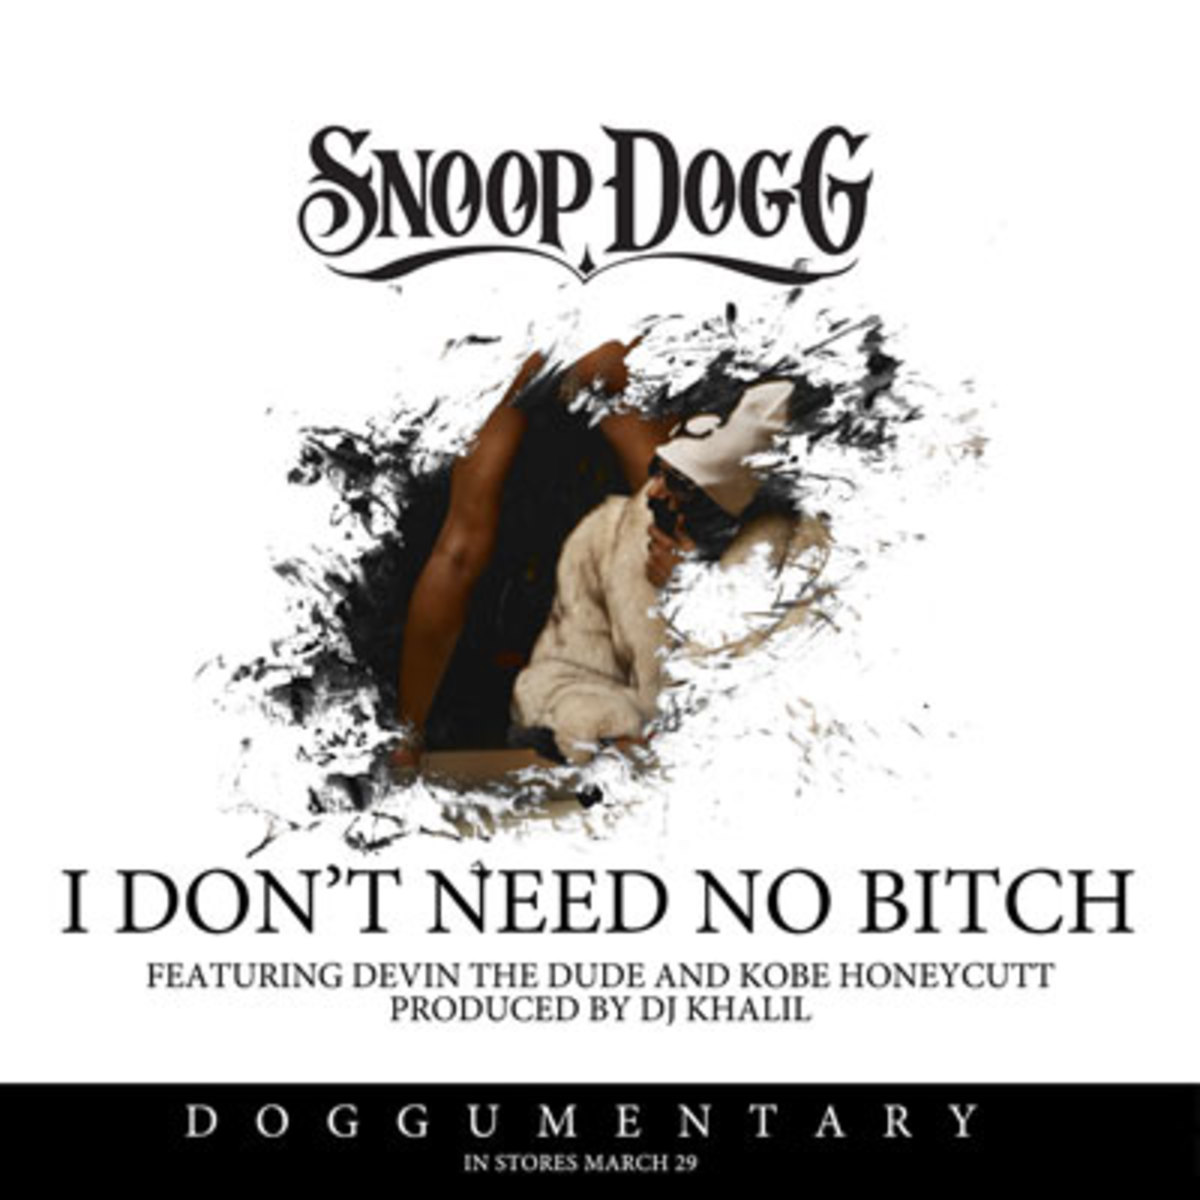 snoopdogg-idontneednobtch.jpg